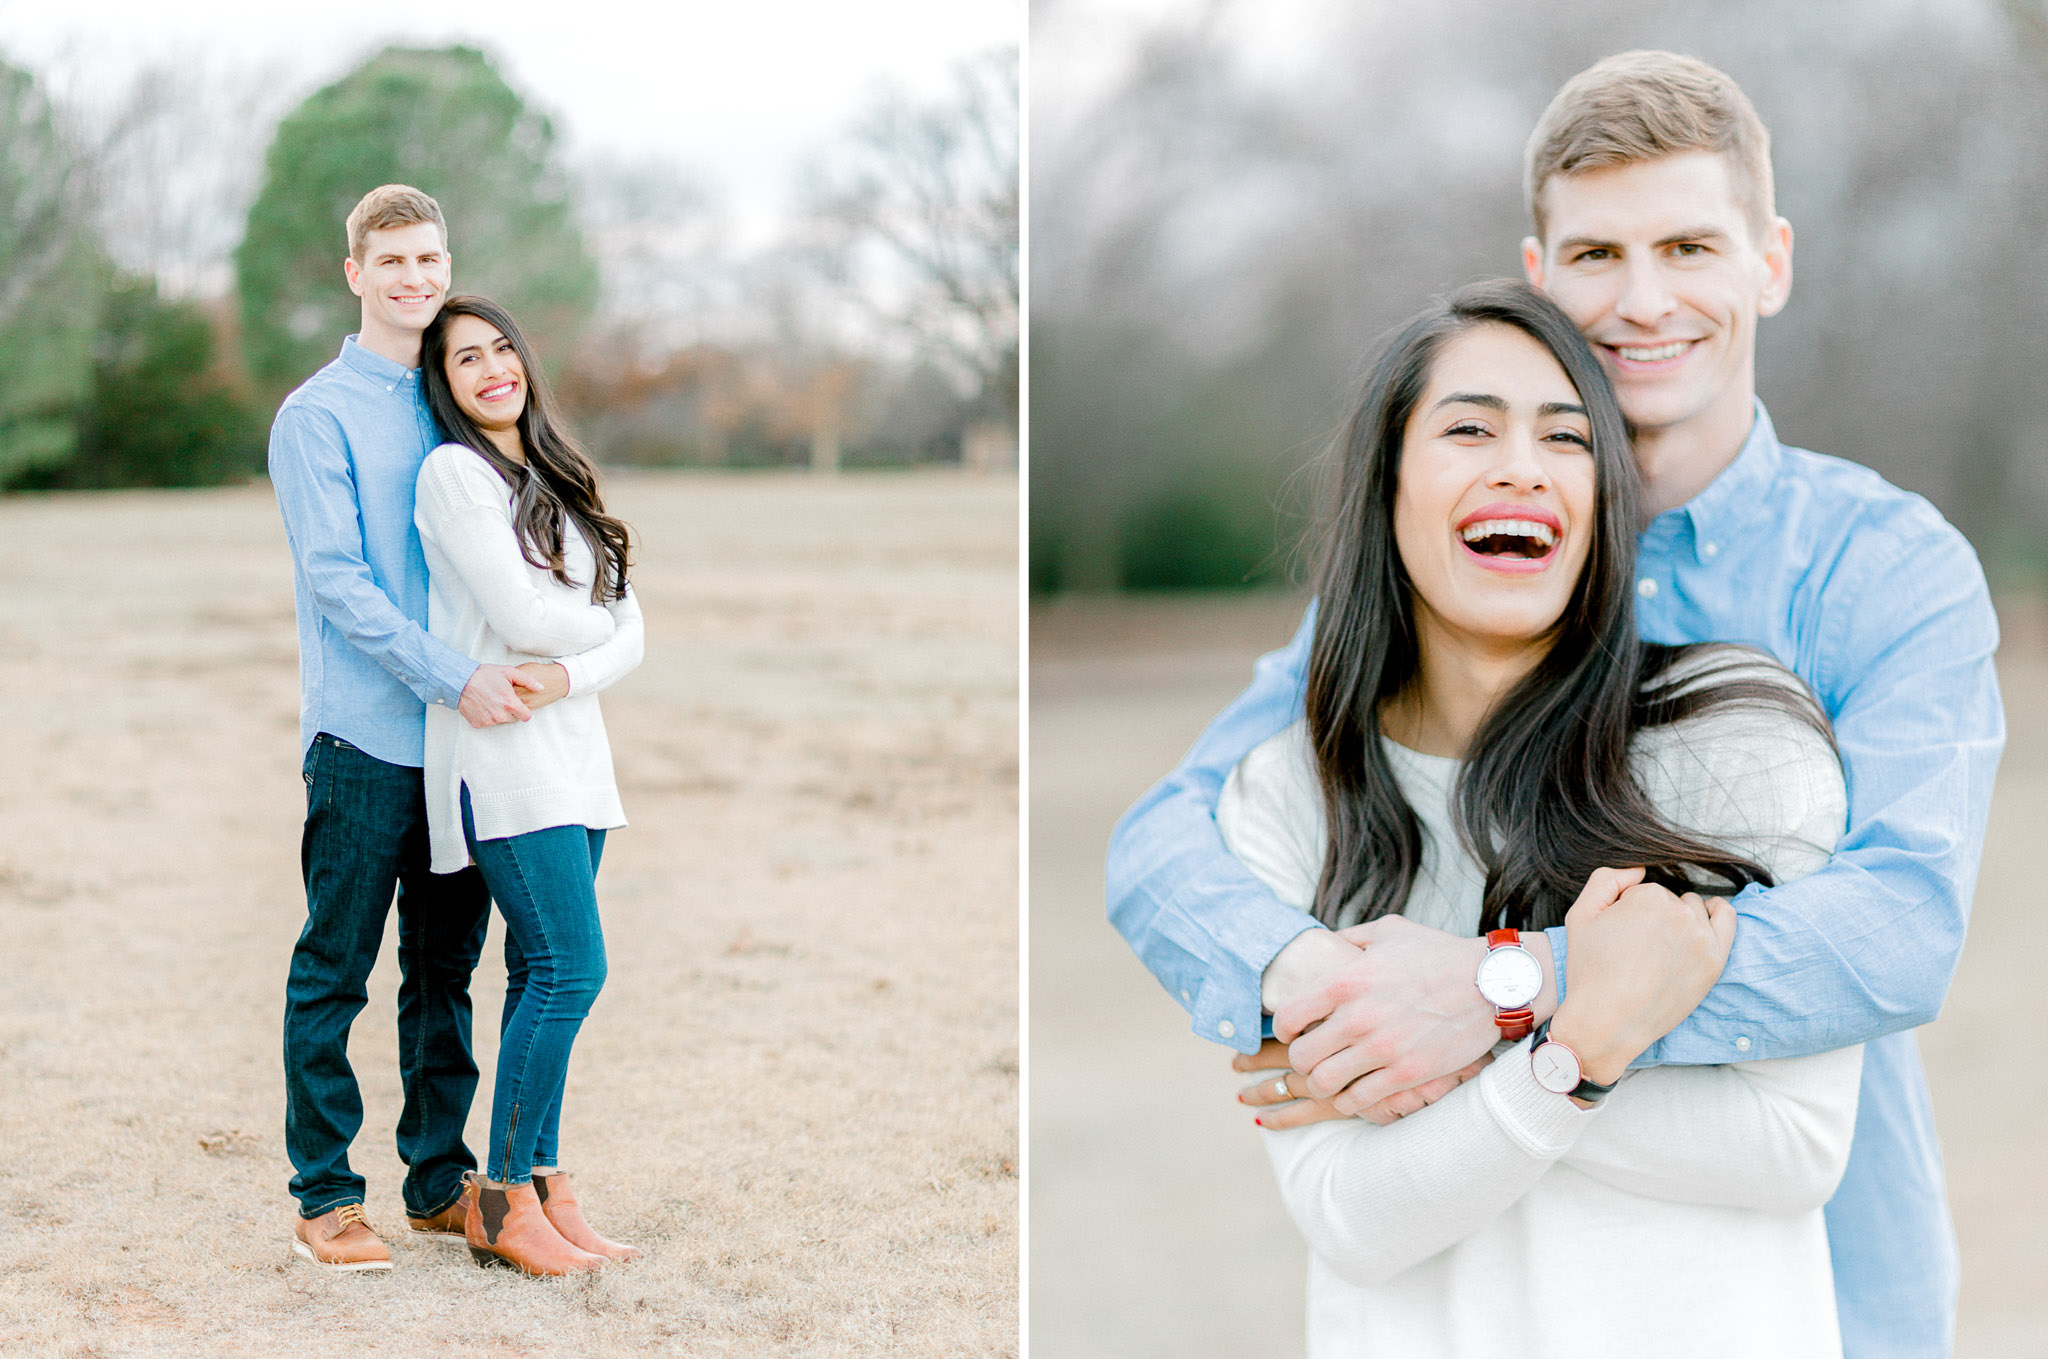 SAFB Engagement Photos - Timeless Photography